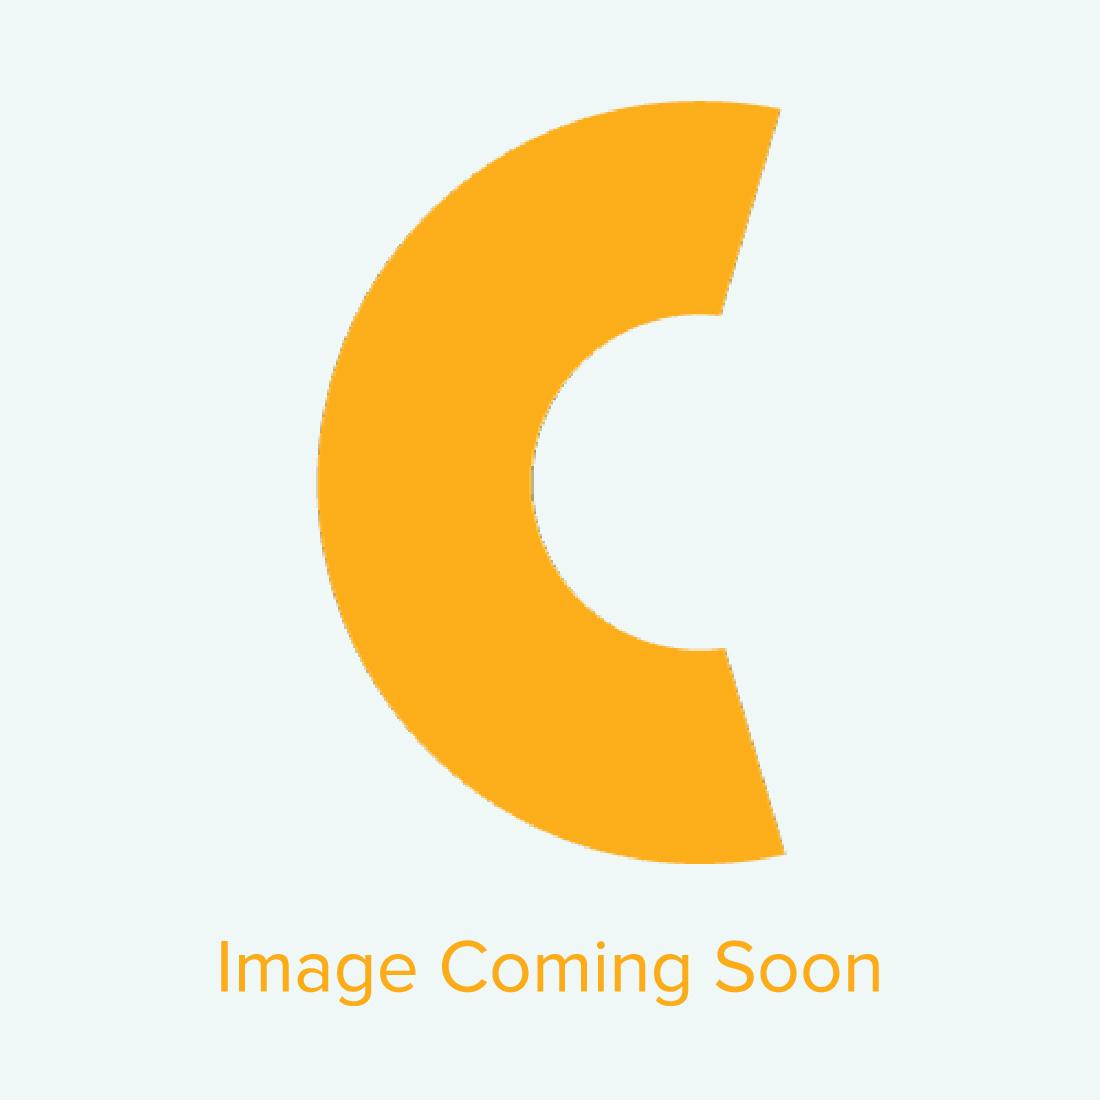 "ChromaLuxe Sublimation Aluminum Photo Panel - 5"" x 5"" (10/case)"